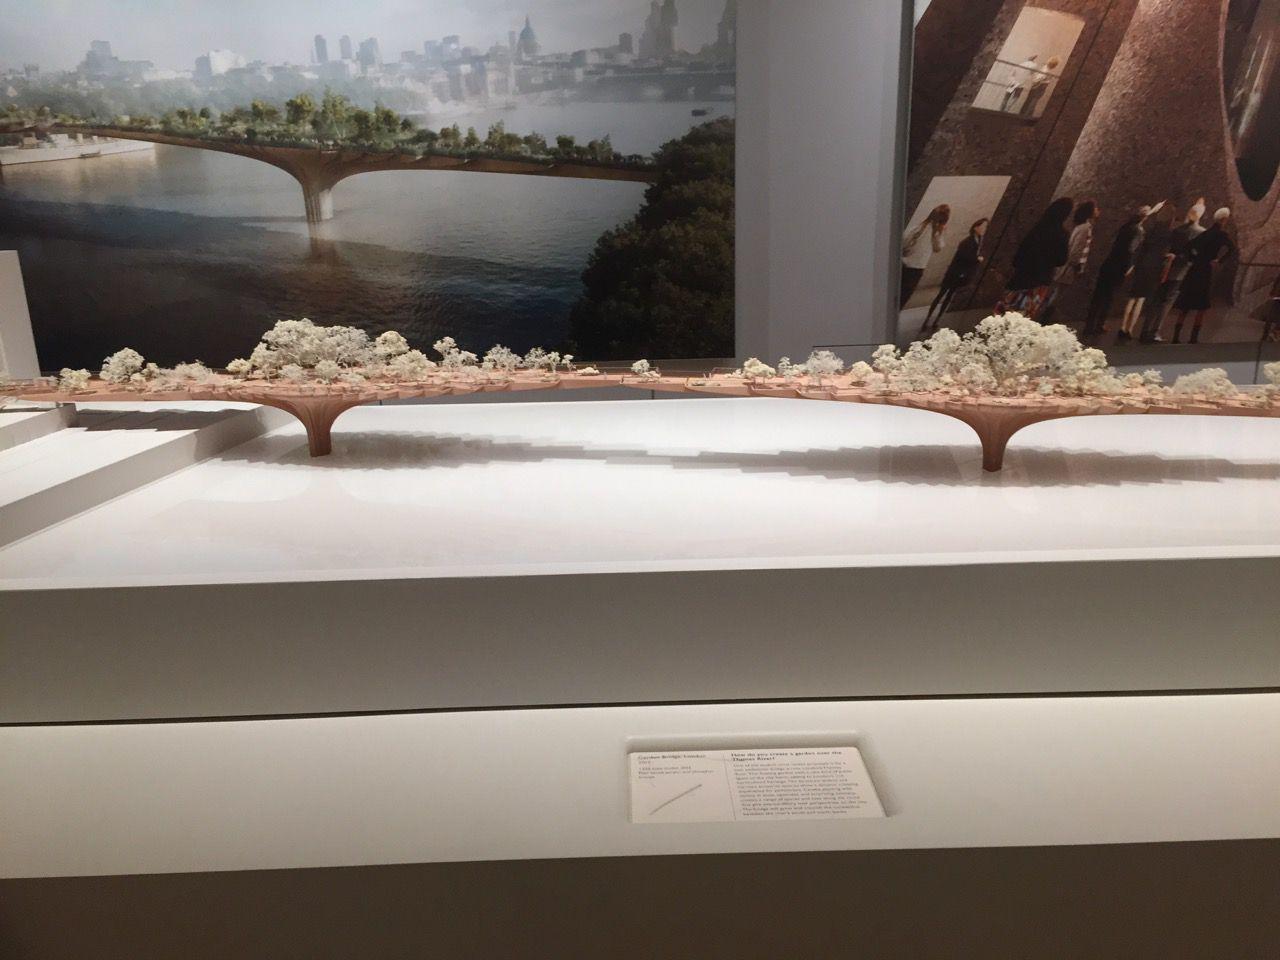 Model of bridge